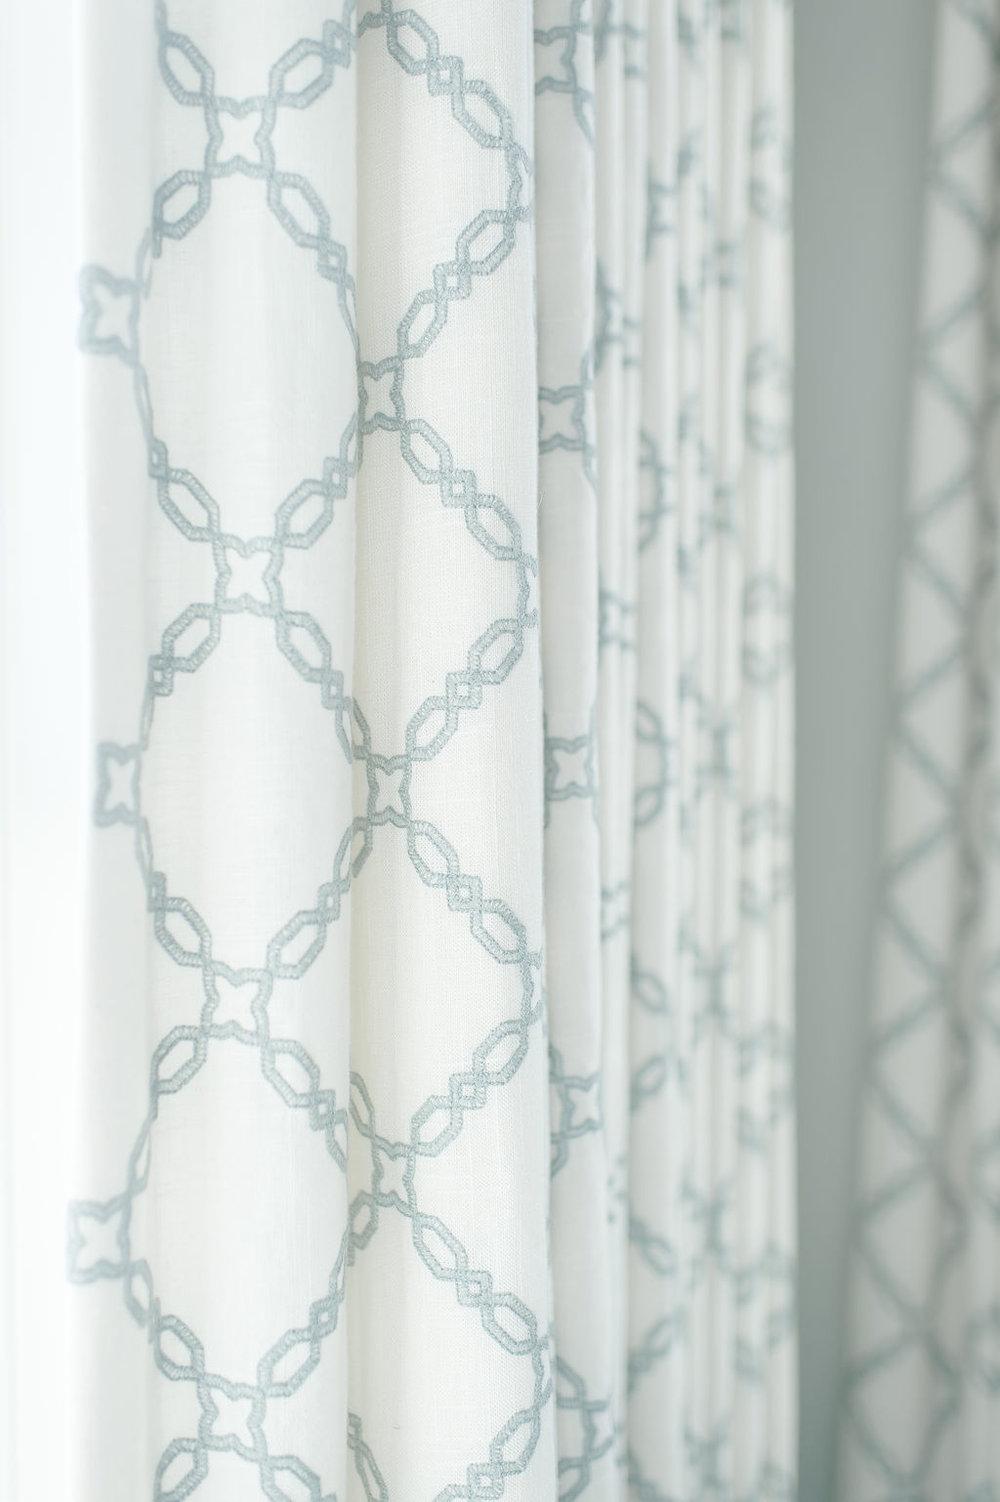 hill-country-transitional-custom-drapes-blue-white.jpg